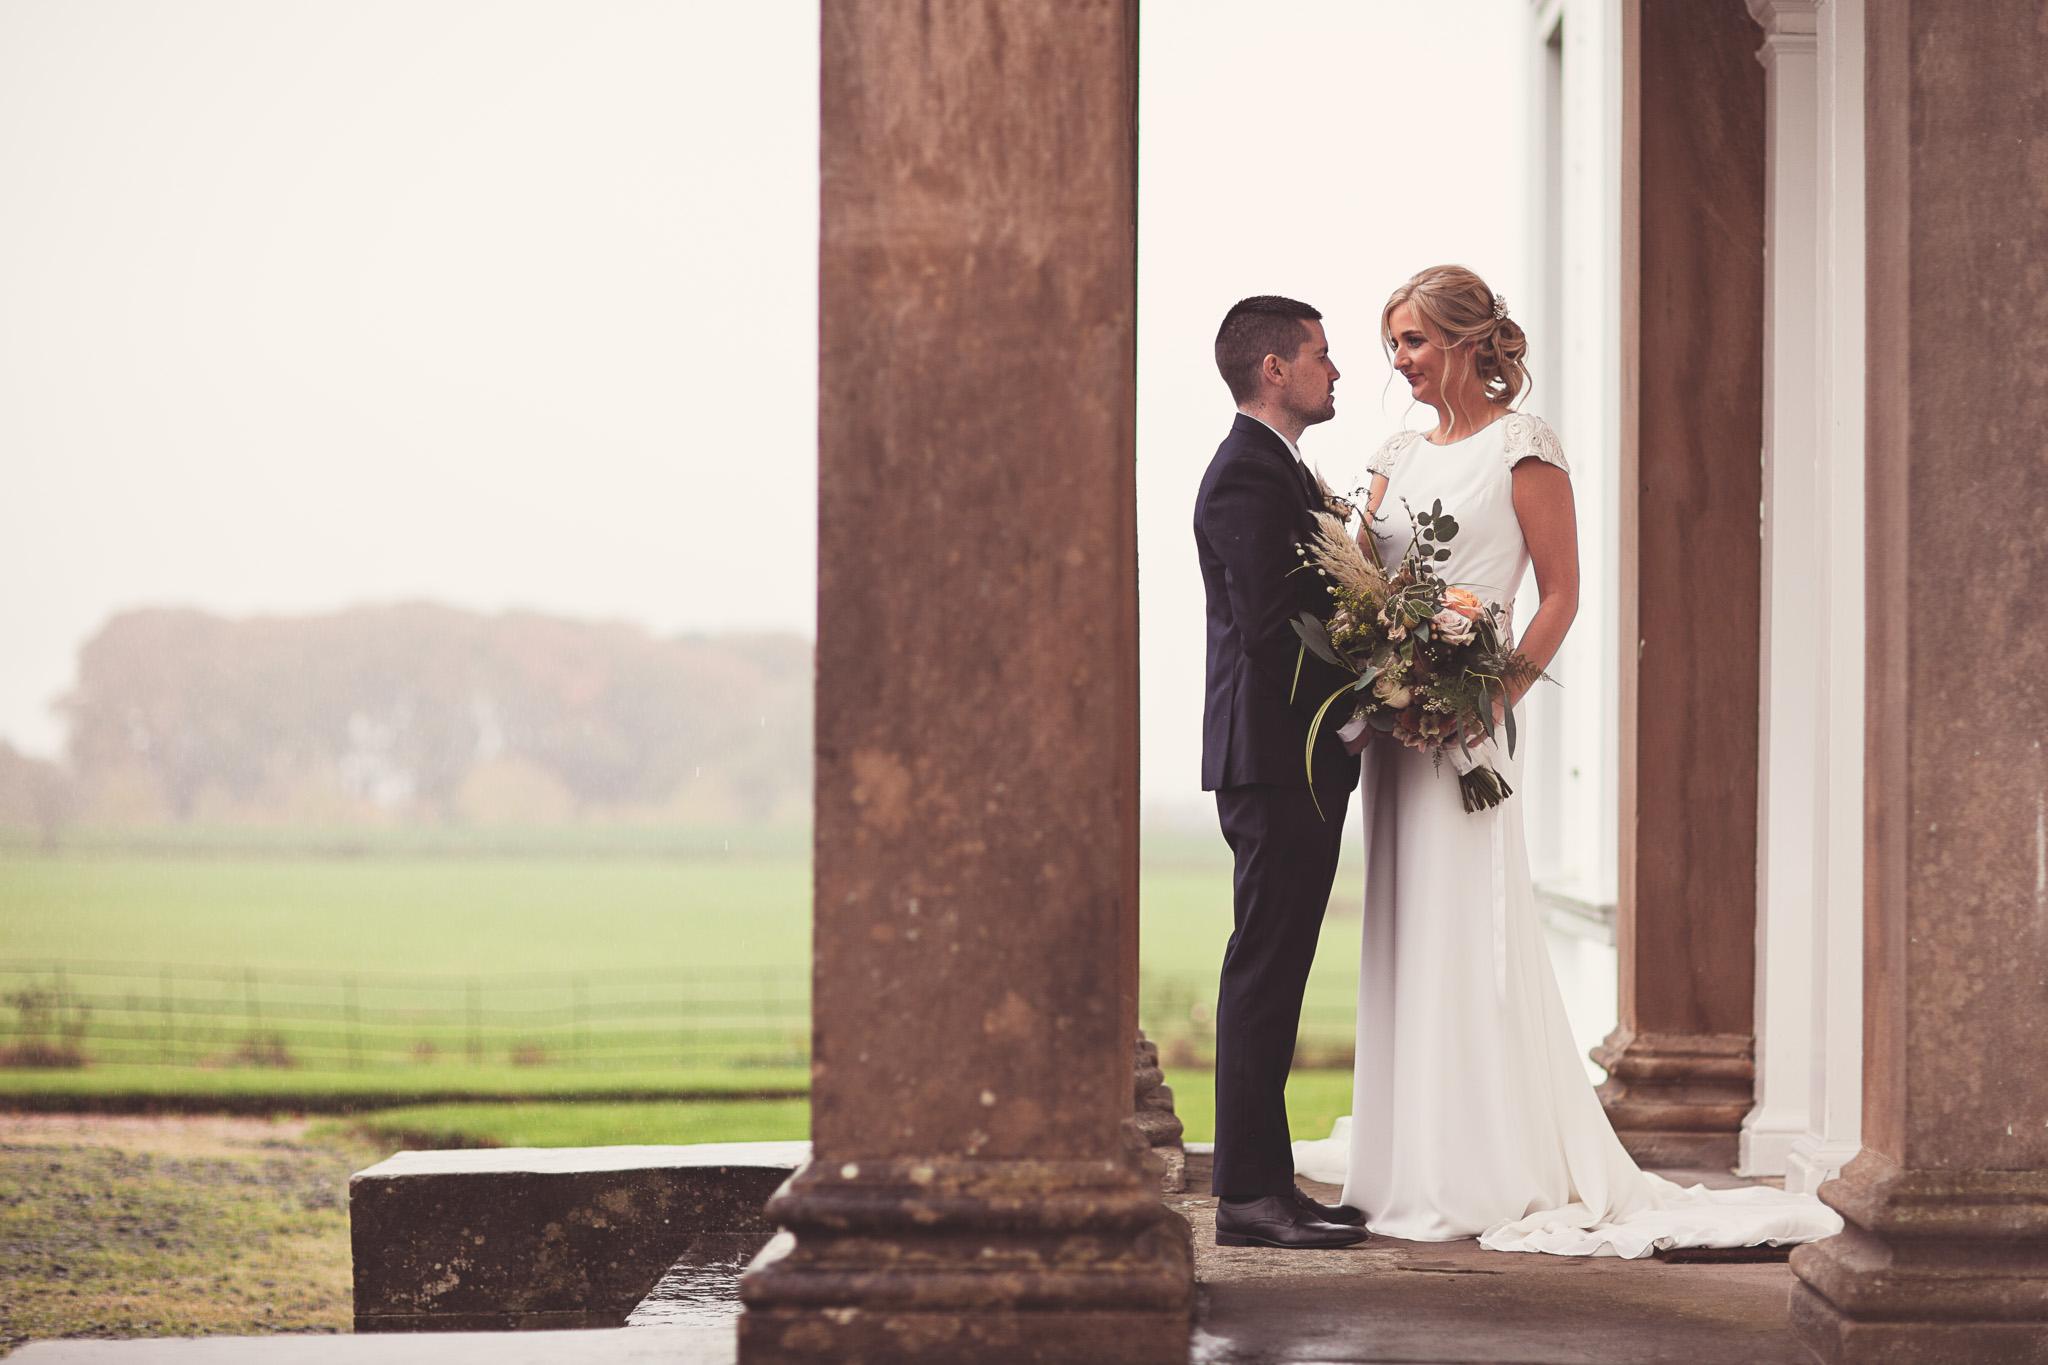 Mark_Barnes_Northern_Ireland_Wedding_Photography_Ballyscullion_Park_Wedding_Photography_Stef&Bobby-30.jpg